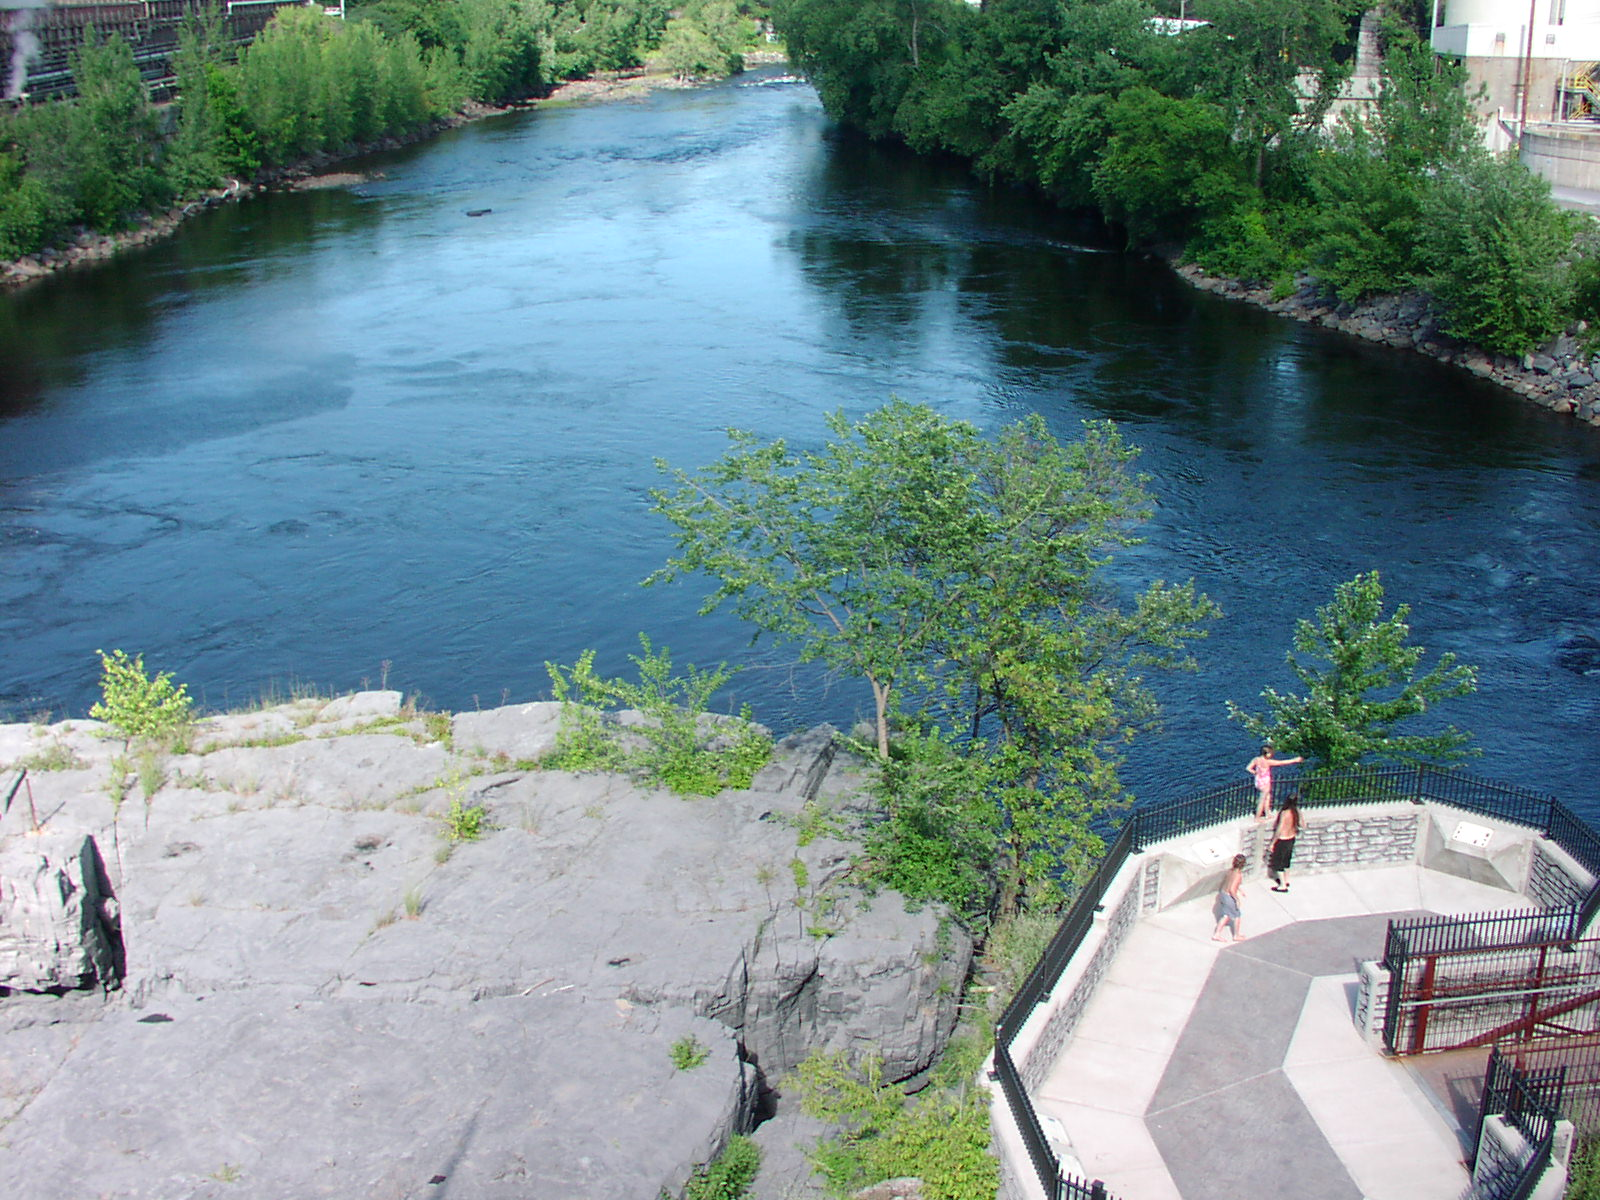 cat-glens-falls-coopers-cave-overlook-hudson-river-t-holmes-2010.jpg